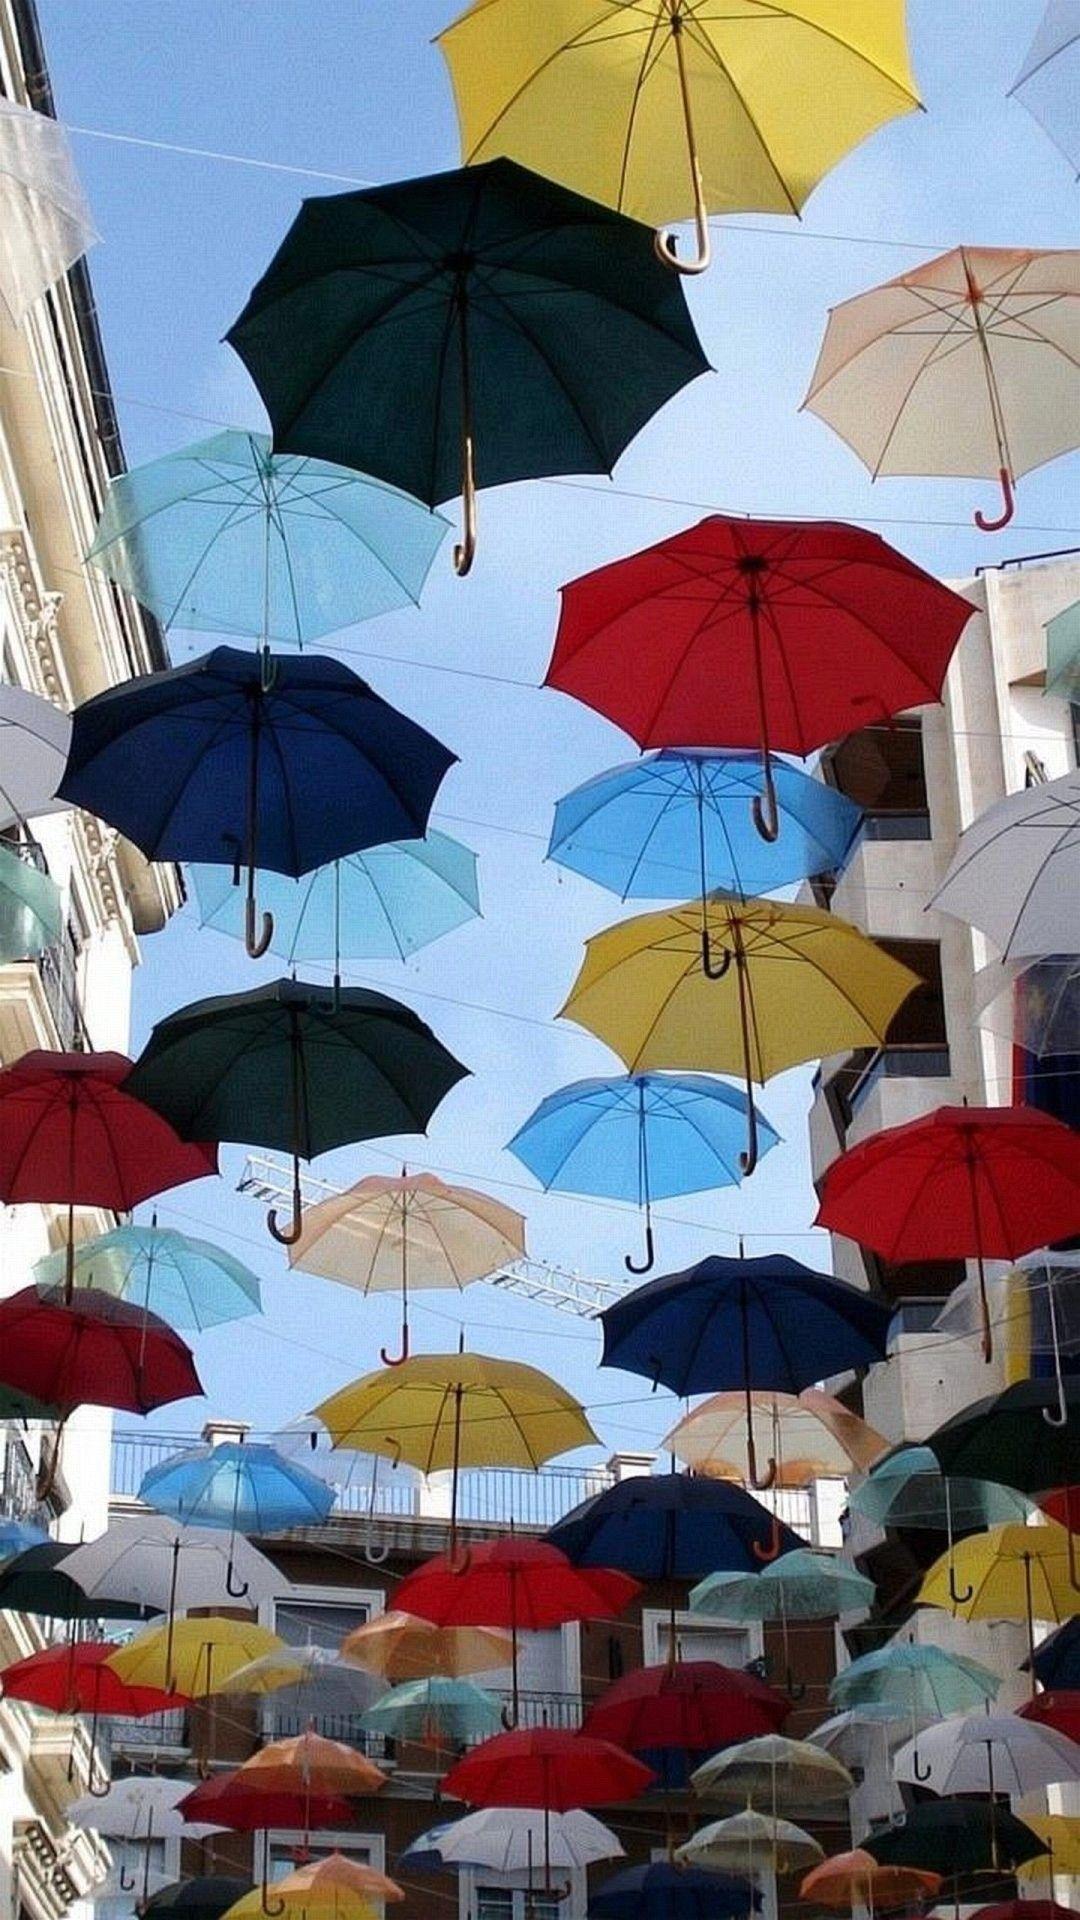 Wallpaper iphone umbrella - Z Wallpaper Iphone 6 Plus Umbrellas 5 5 Inches 91